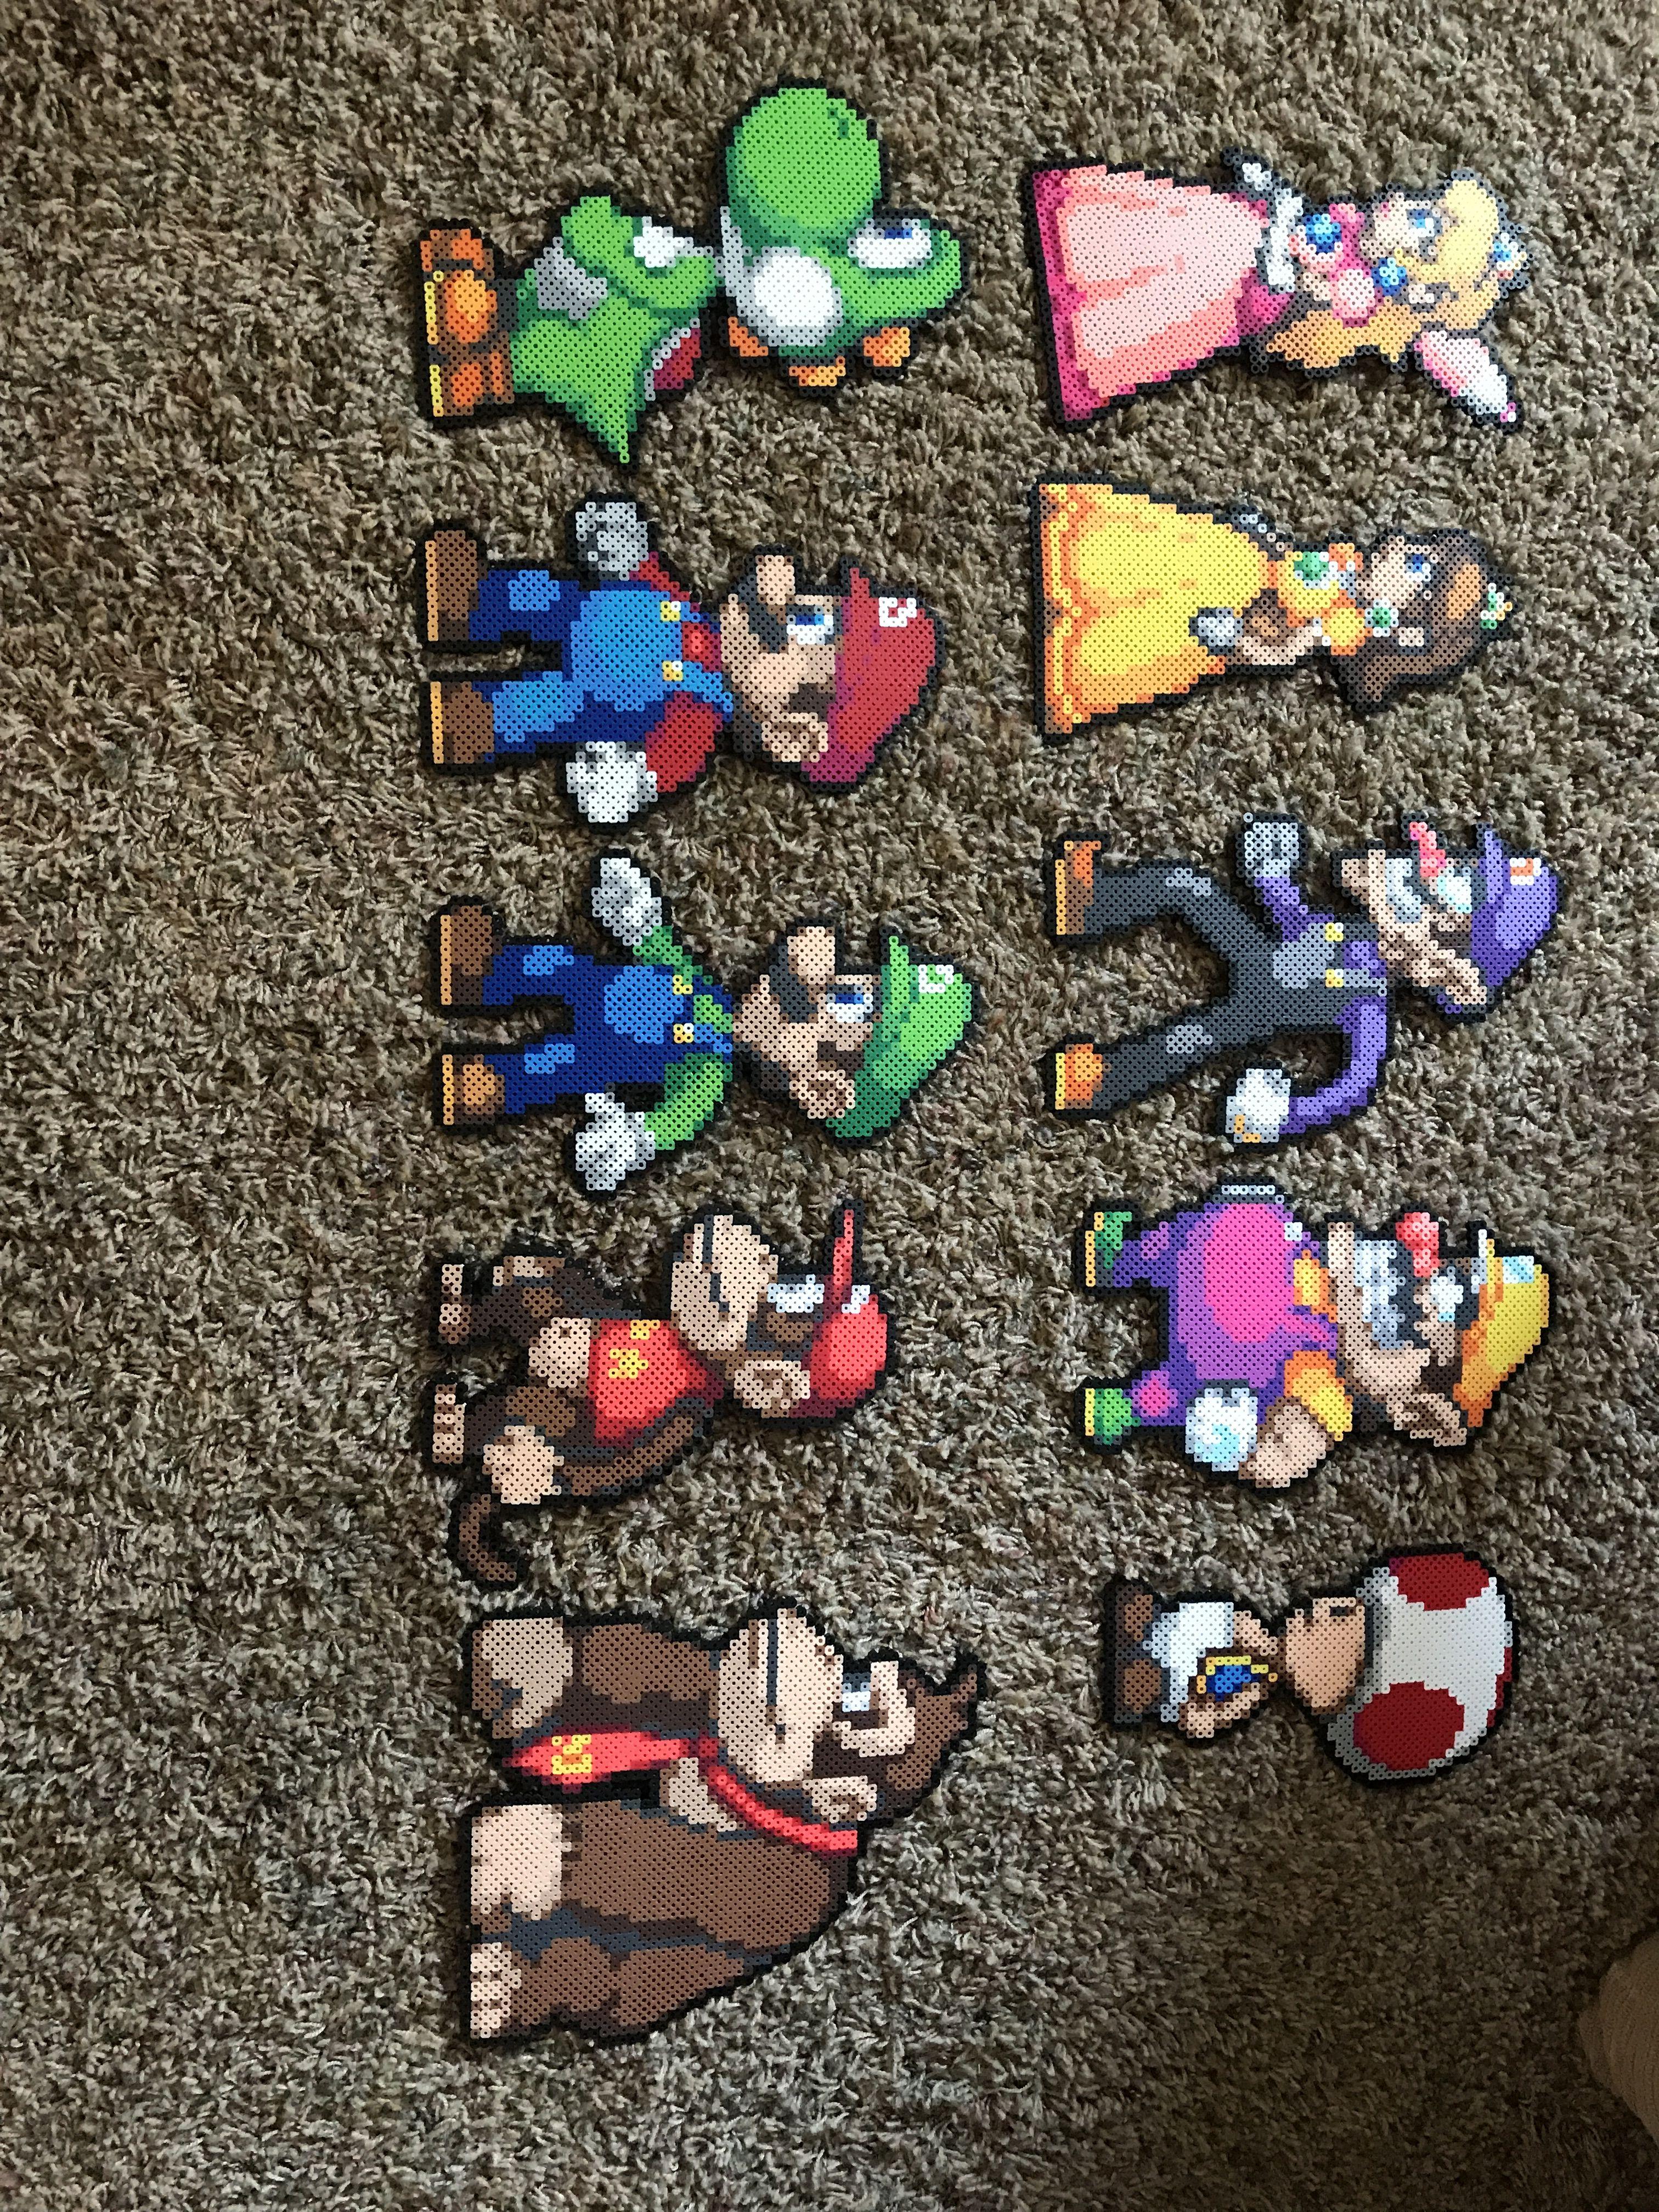 Mario party perler beads | Perler Beads- Video Games